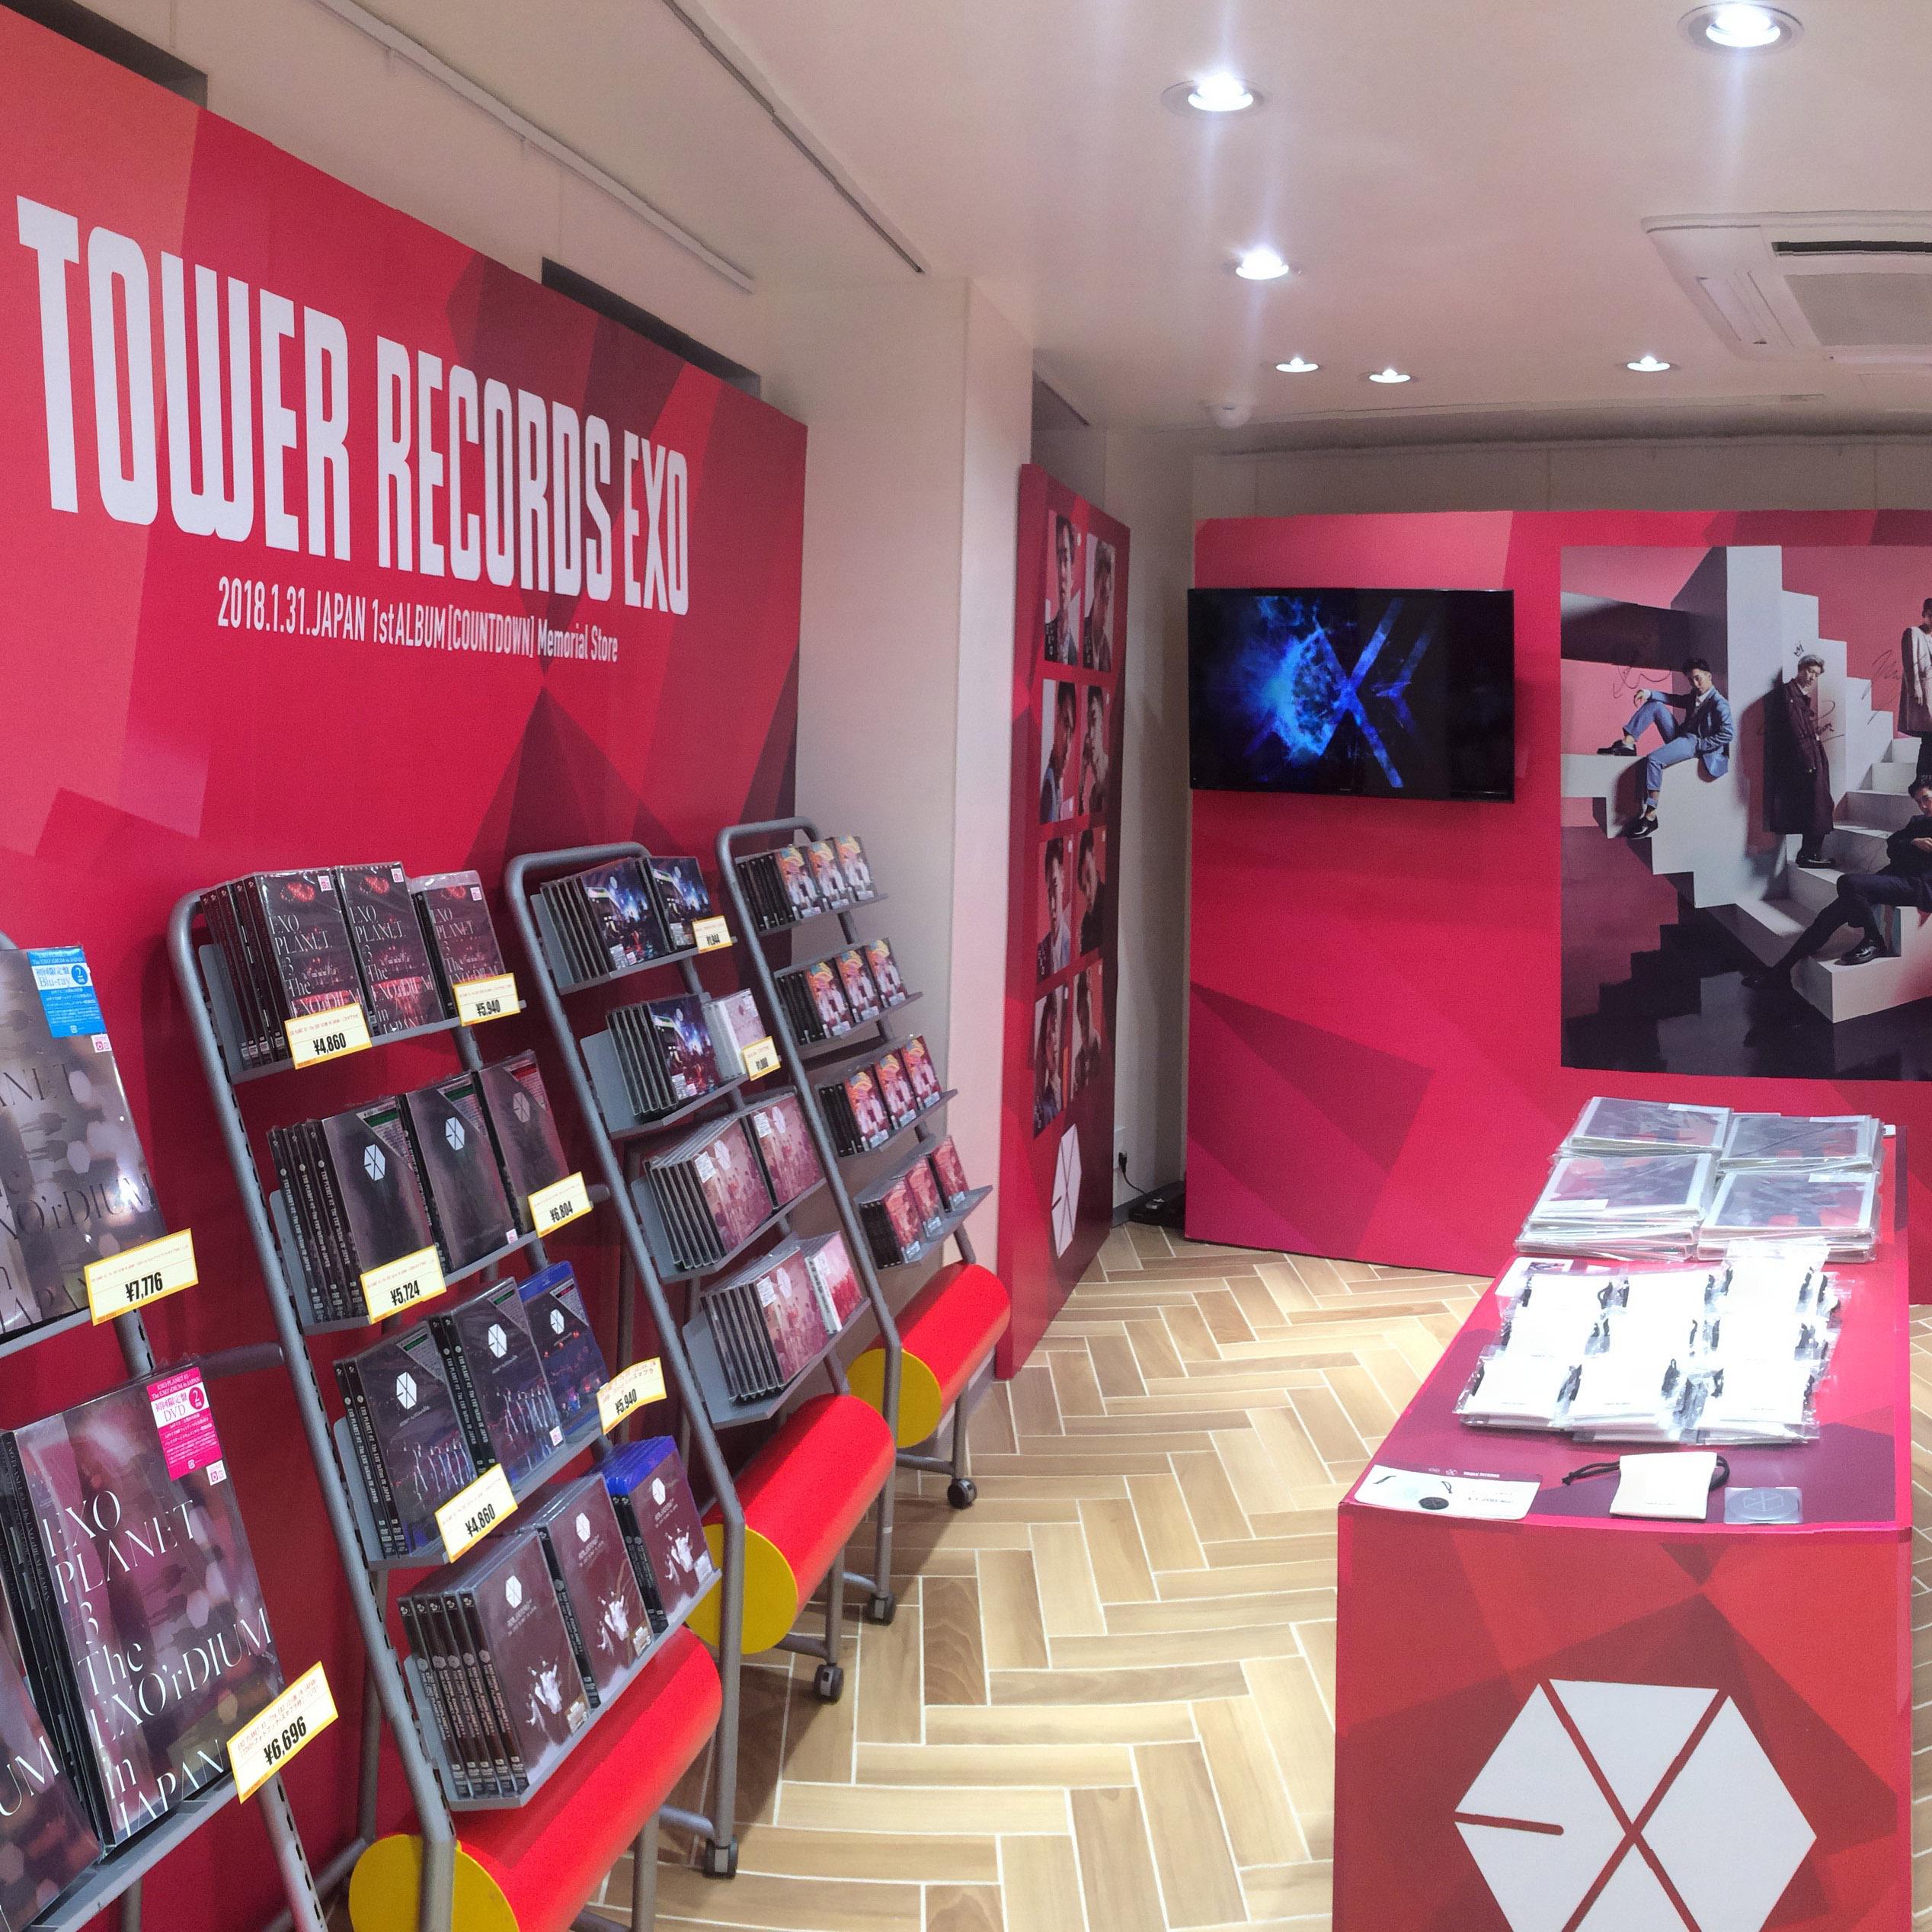 TOWER RECORD EXO - thumb1